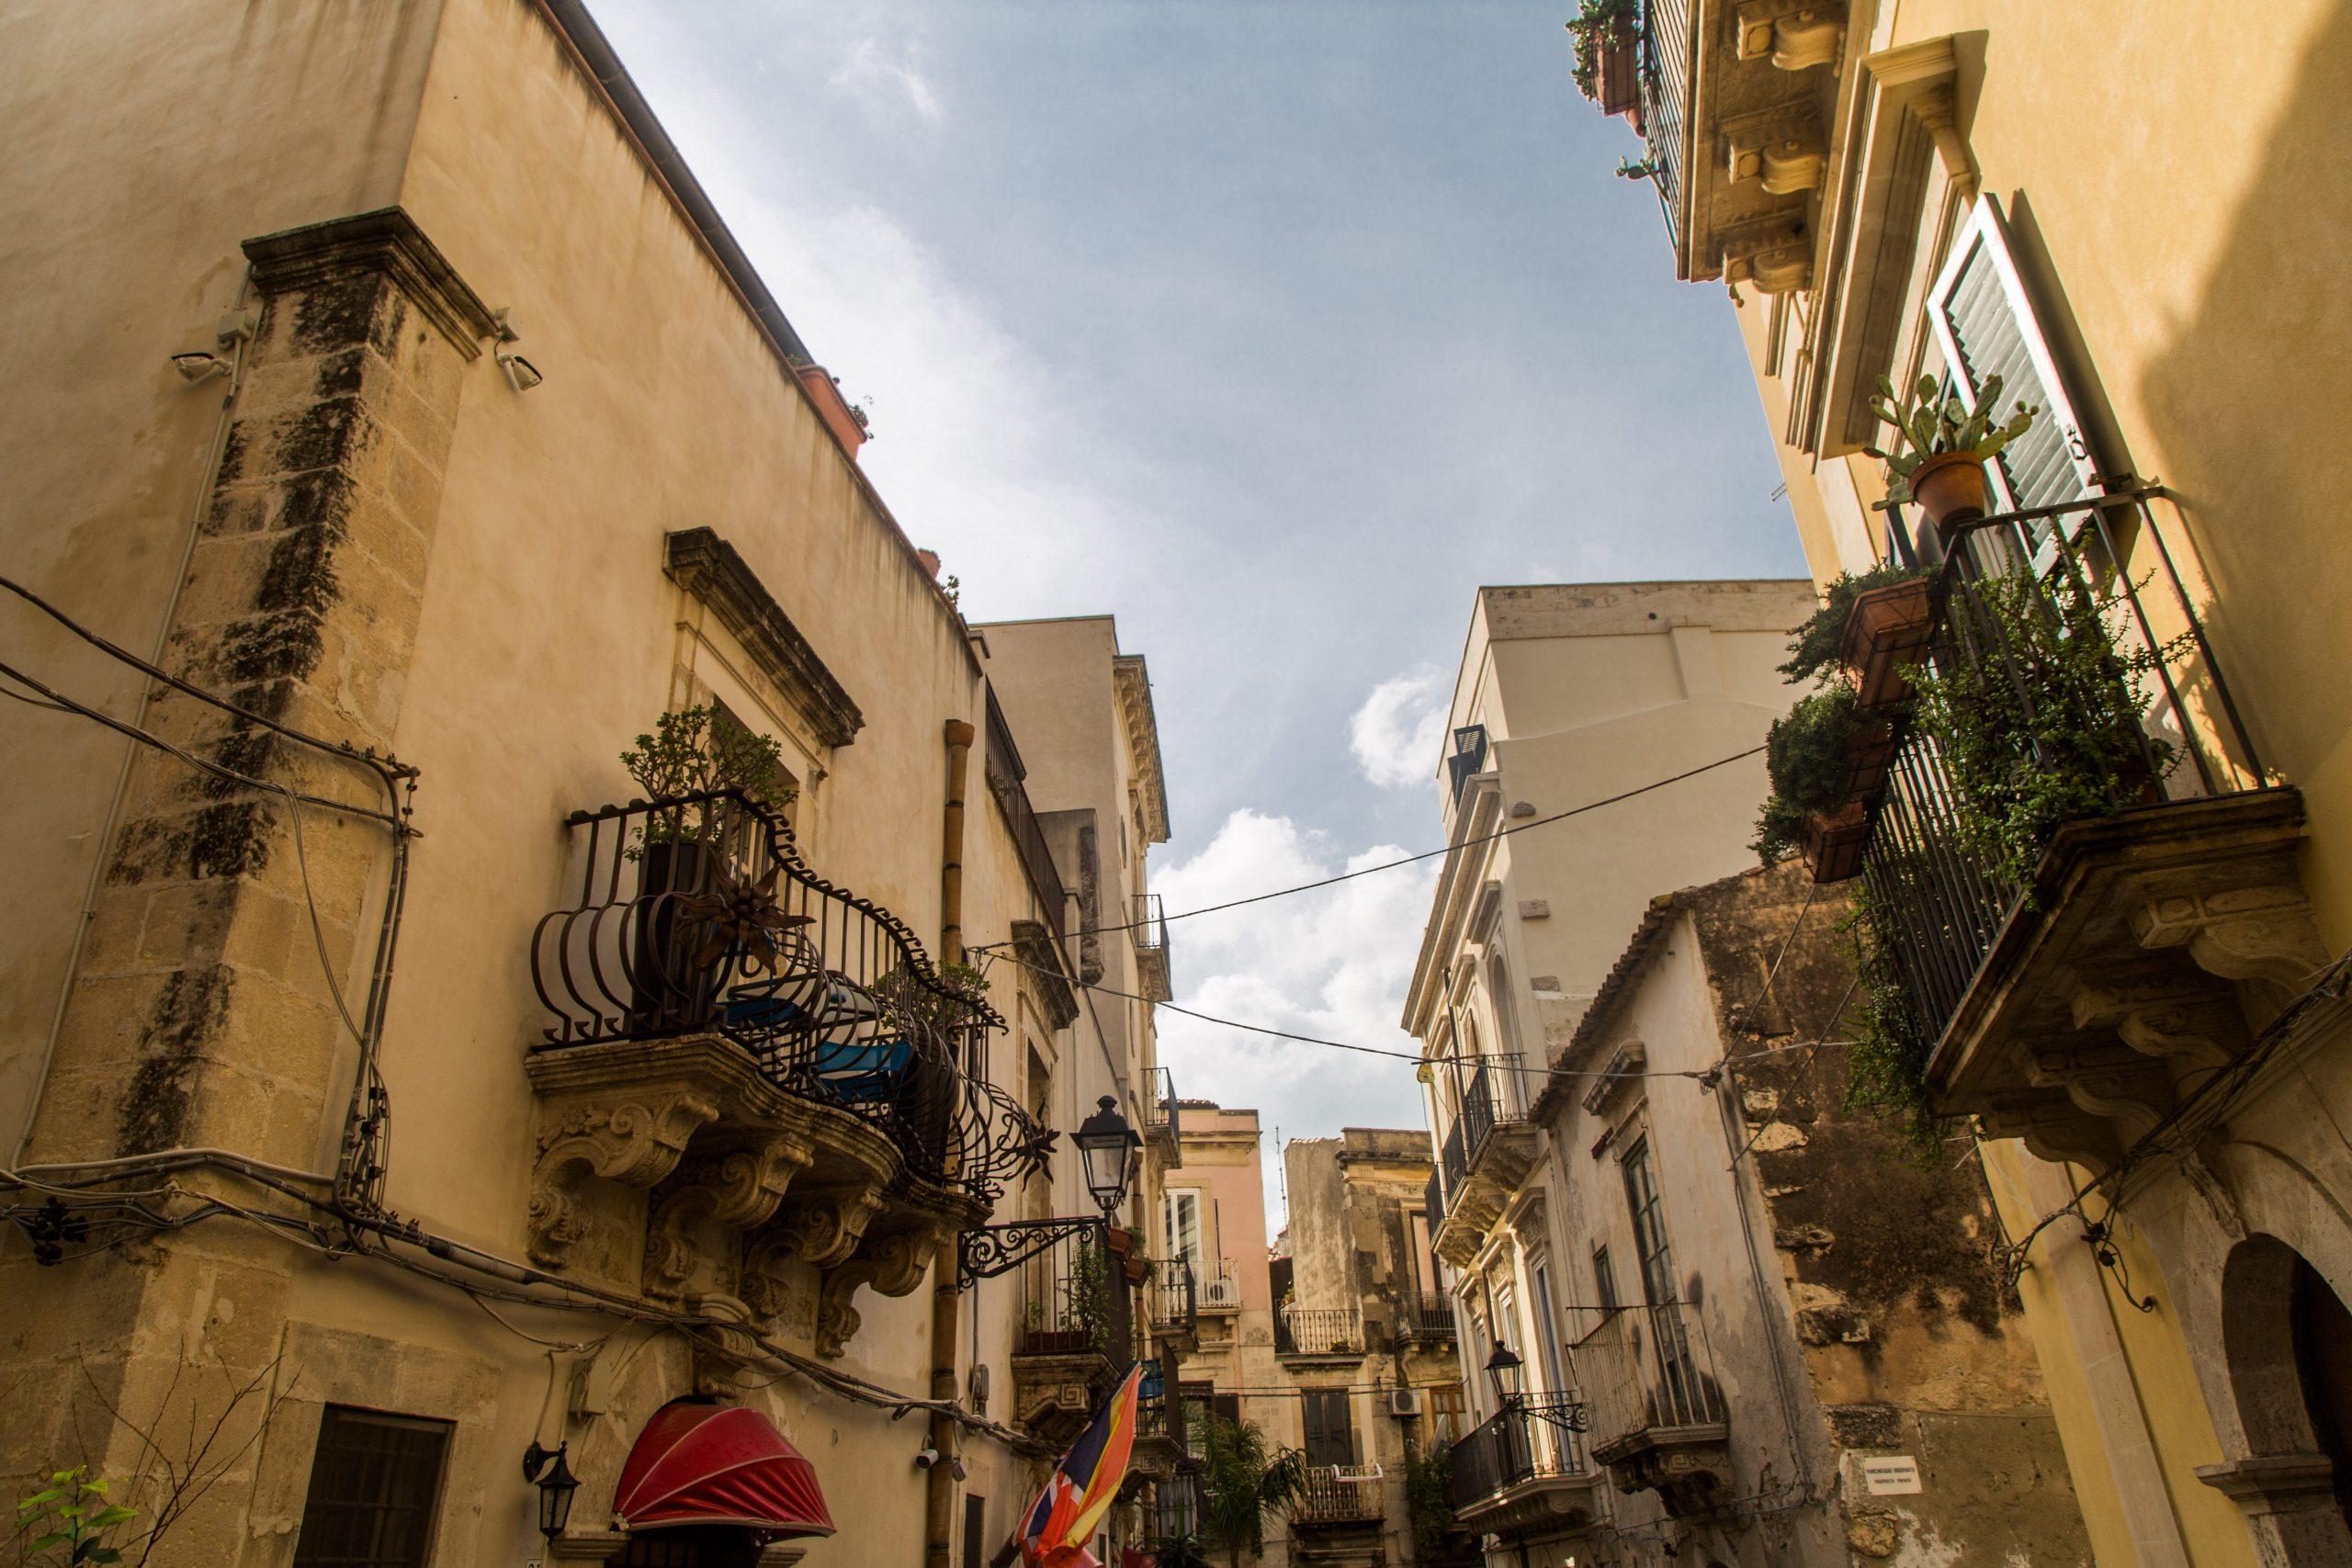 Fabian Fröhlich, Siracusa, Ortygia, Street view